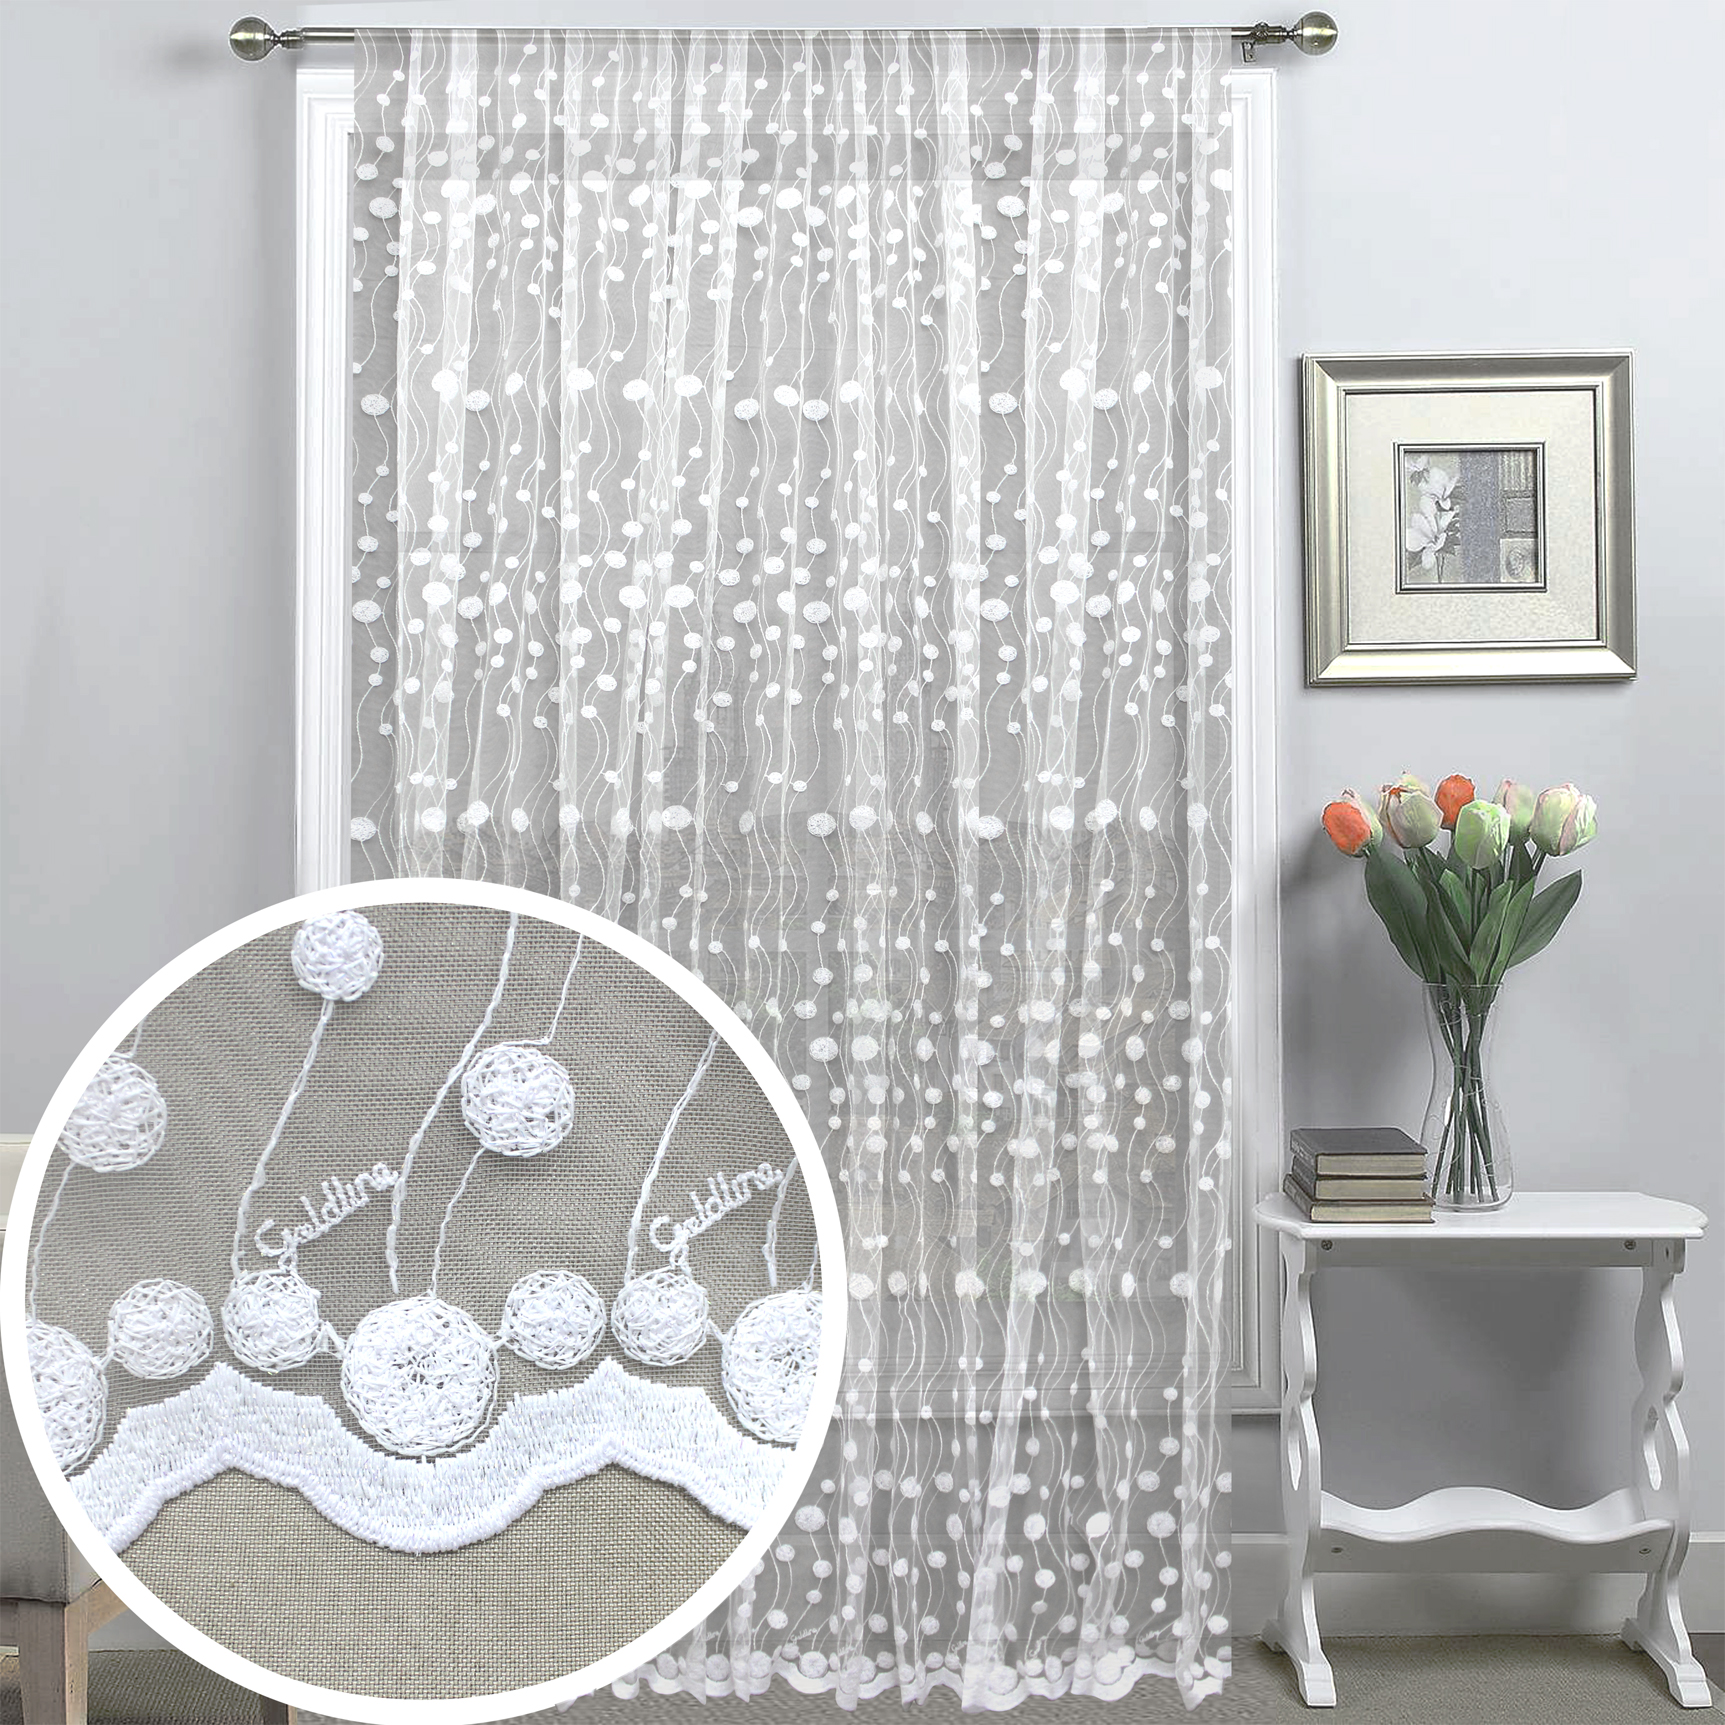 Шторы Amore Mio Классические шторы Huldah Цвет: Белый